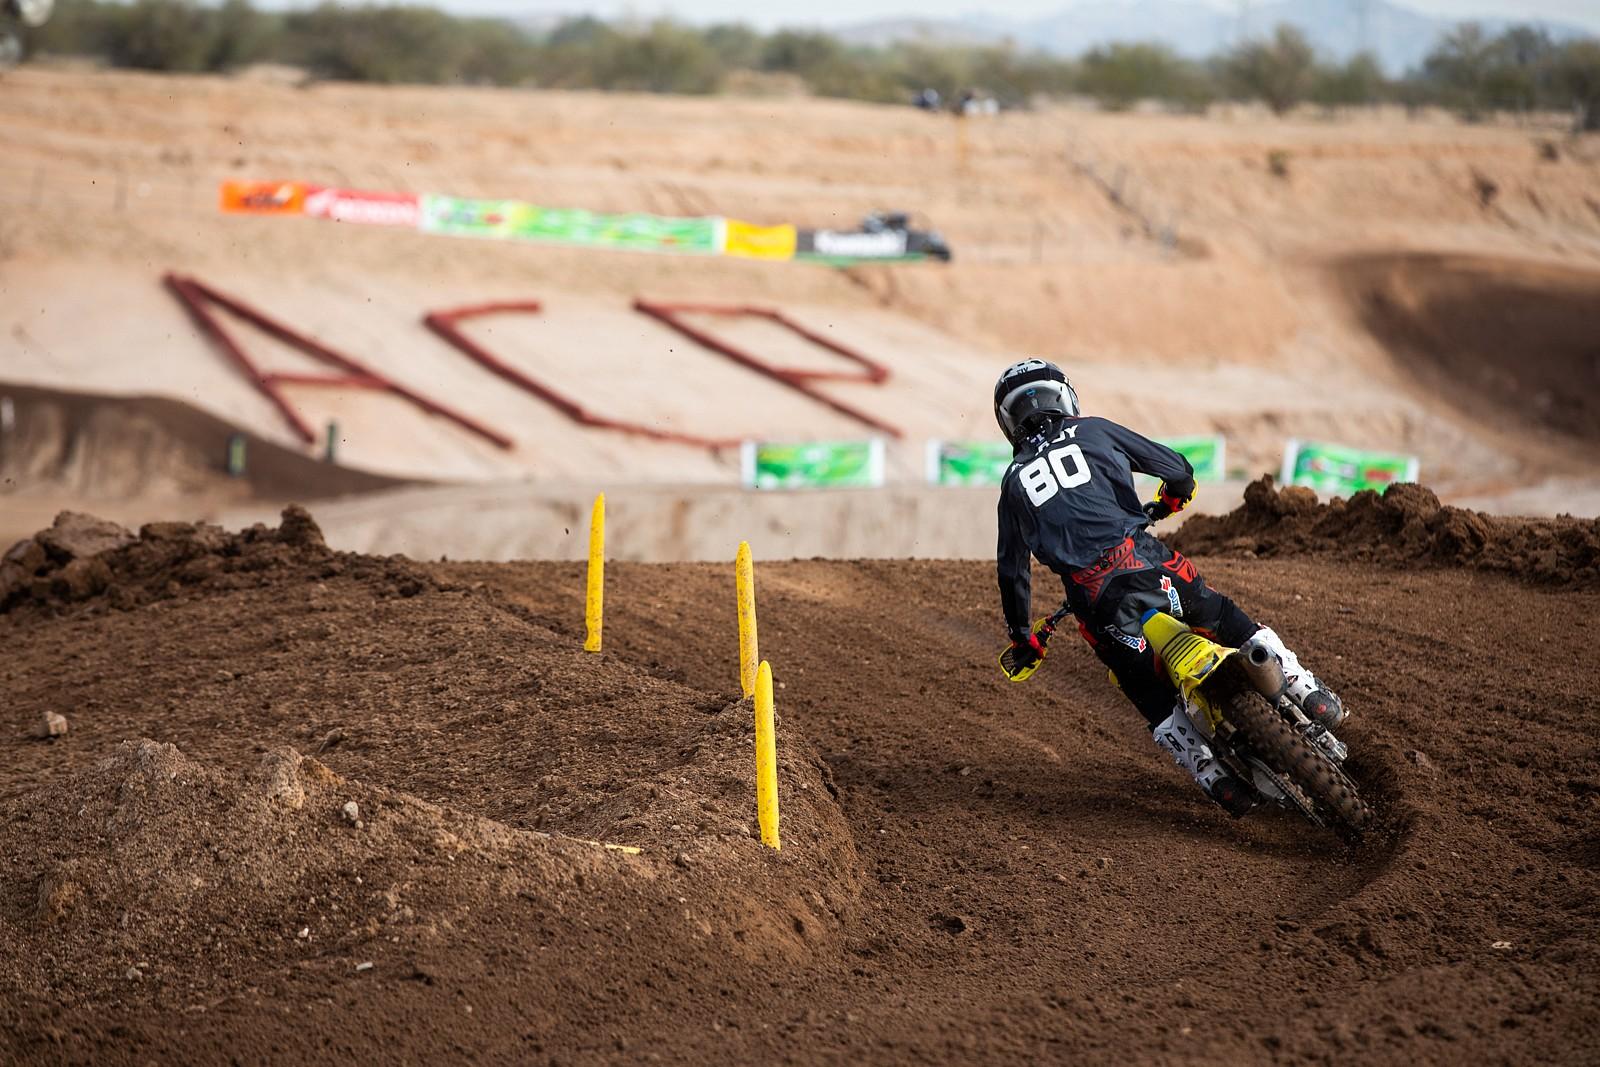 Preston Kilroy - AZ Open of Motocross, Part 2 - Motocross Pictures - Vital MX